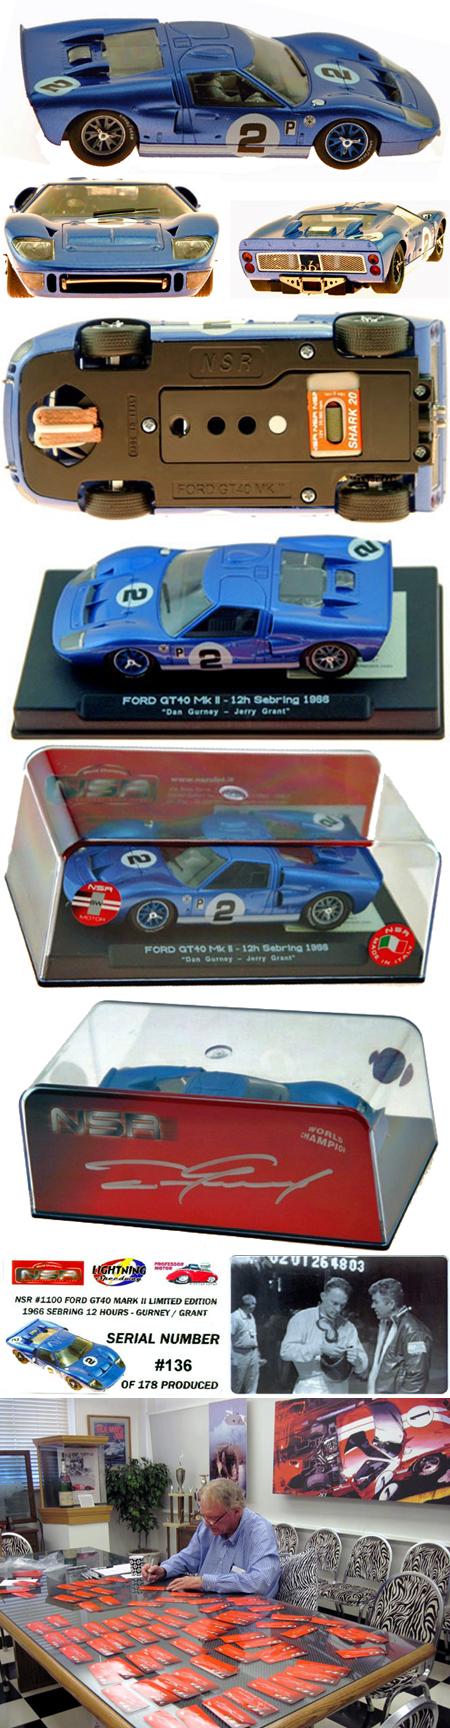 NSR 1100 Ford MkII, blue #2 Sebring 1966